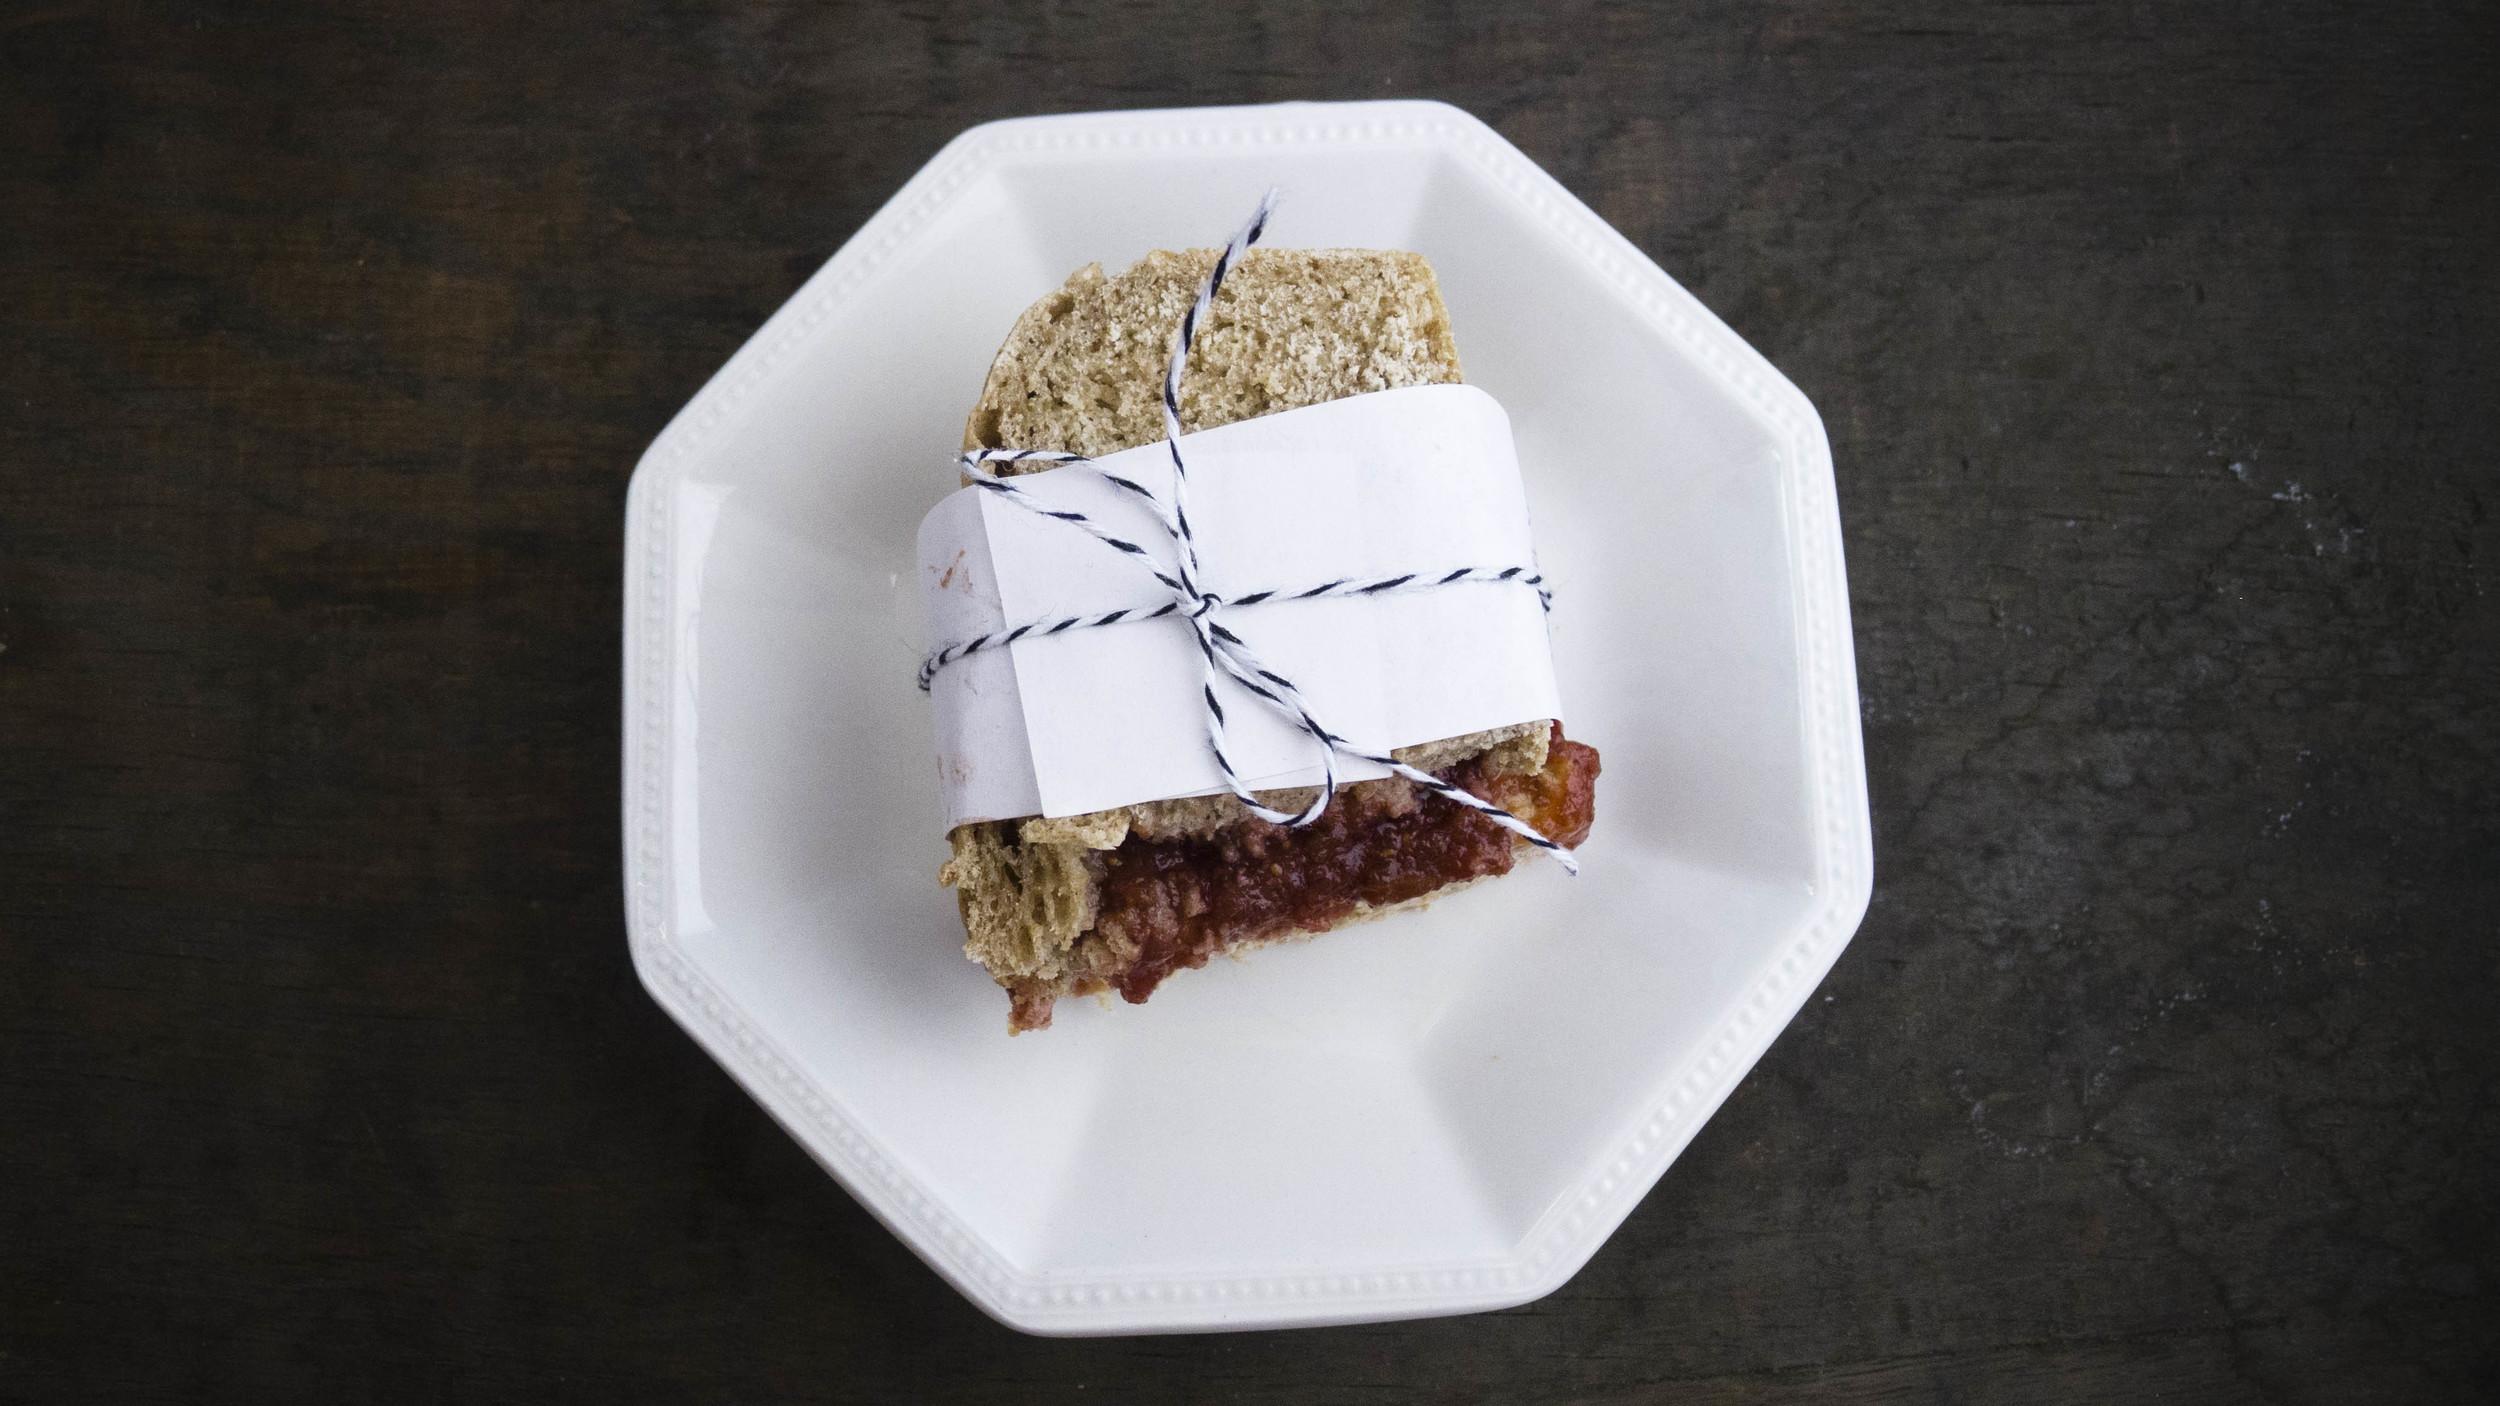 vanilla fig jam and peanut butter sandwich on whole wheat cinnamon bread